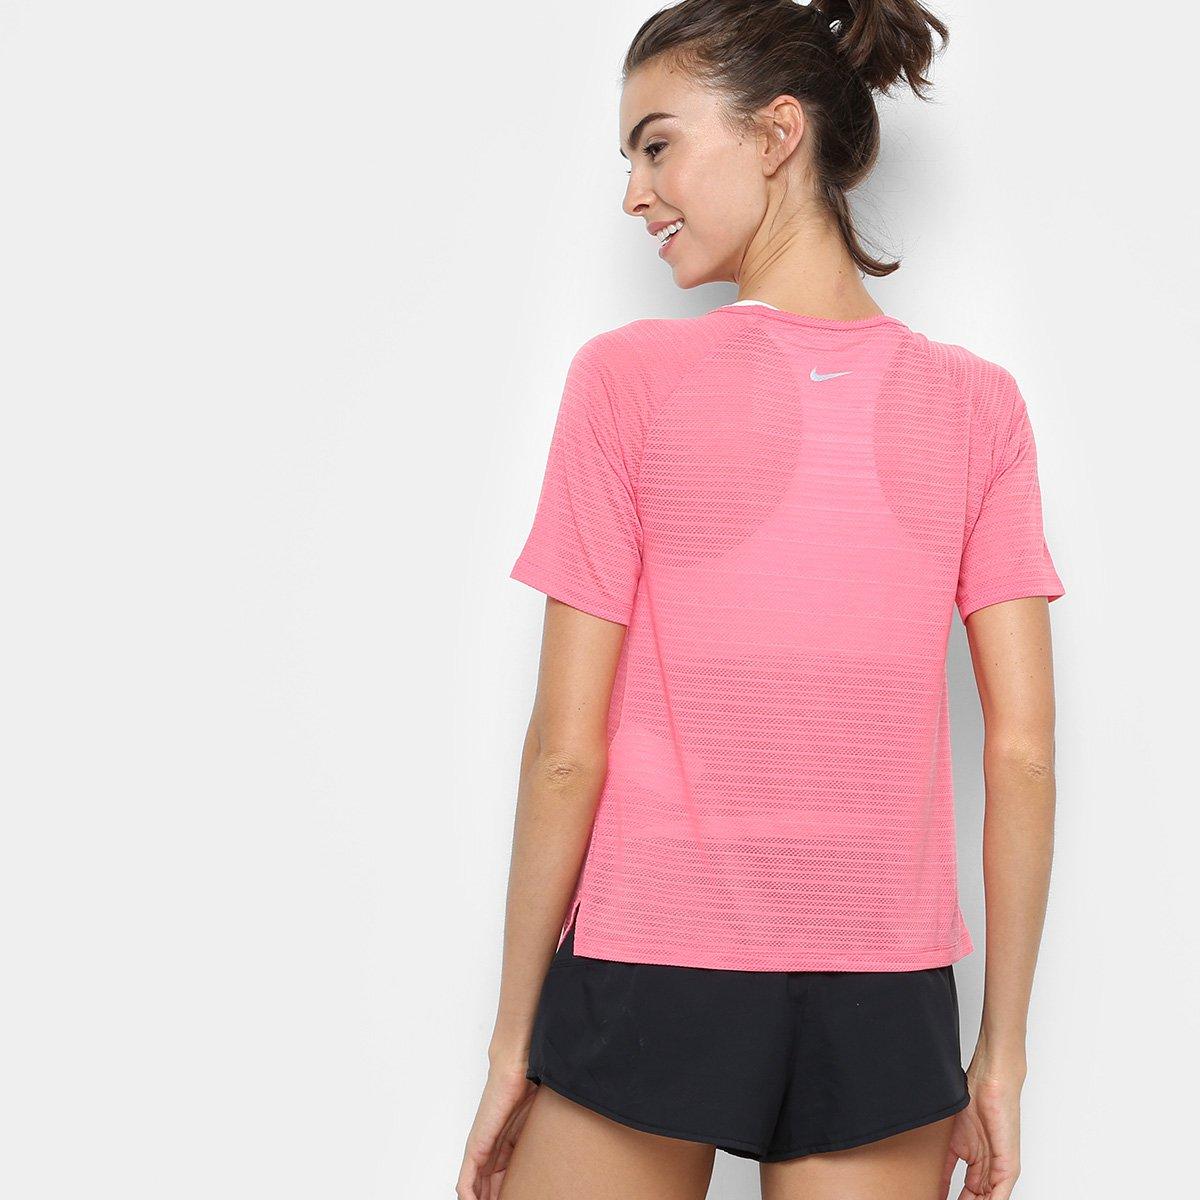 Camiseta Rosa Camiseta Miler Rosa SS Feminina Nike Breathe Miler Feminina Breathe Miler SS Nike Camiseta Nike rrSgA